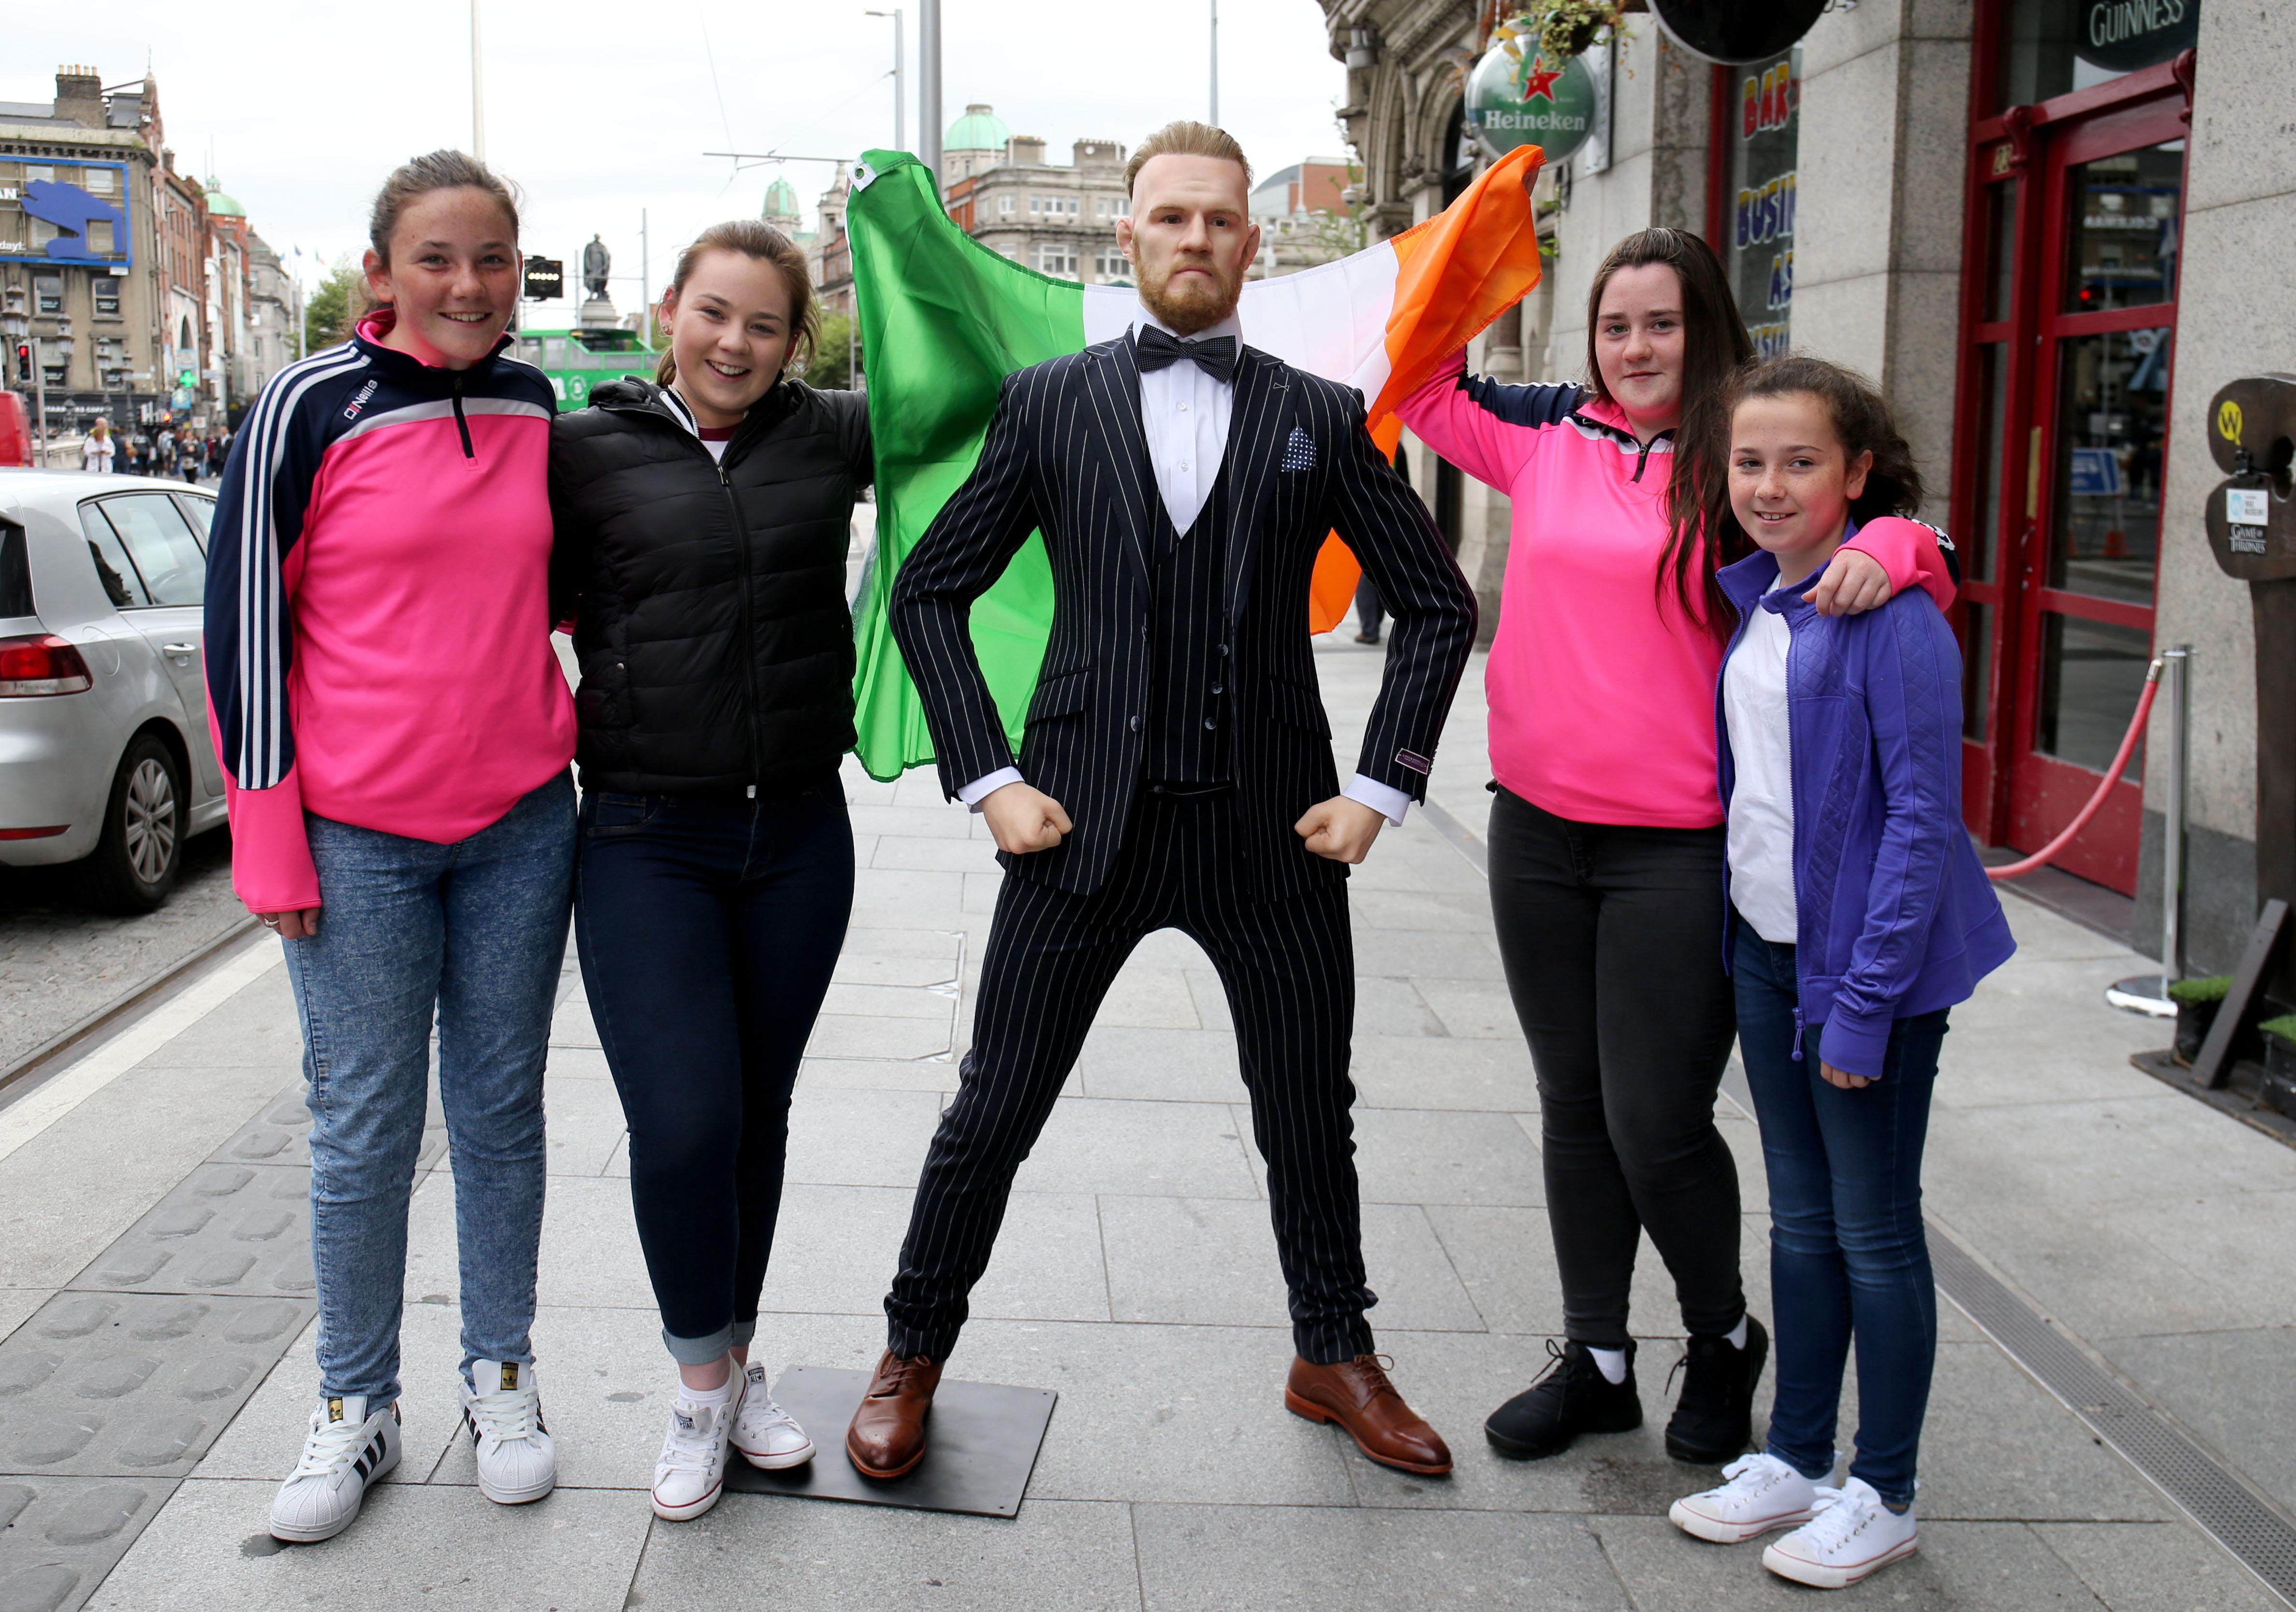 Ireland's National Wax Museum has been forced to defend itself after unveiling McGregor waxwork earlier this week